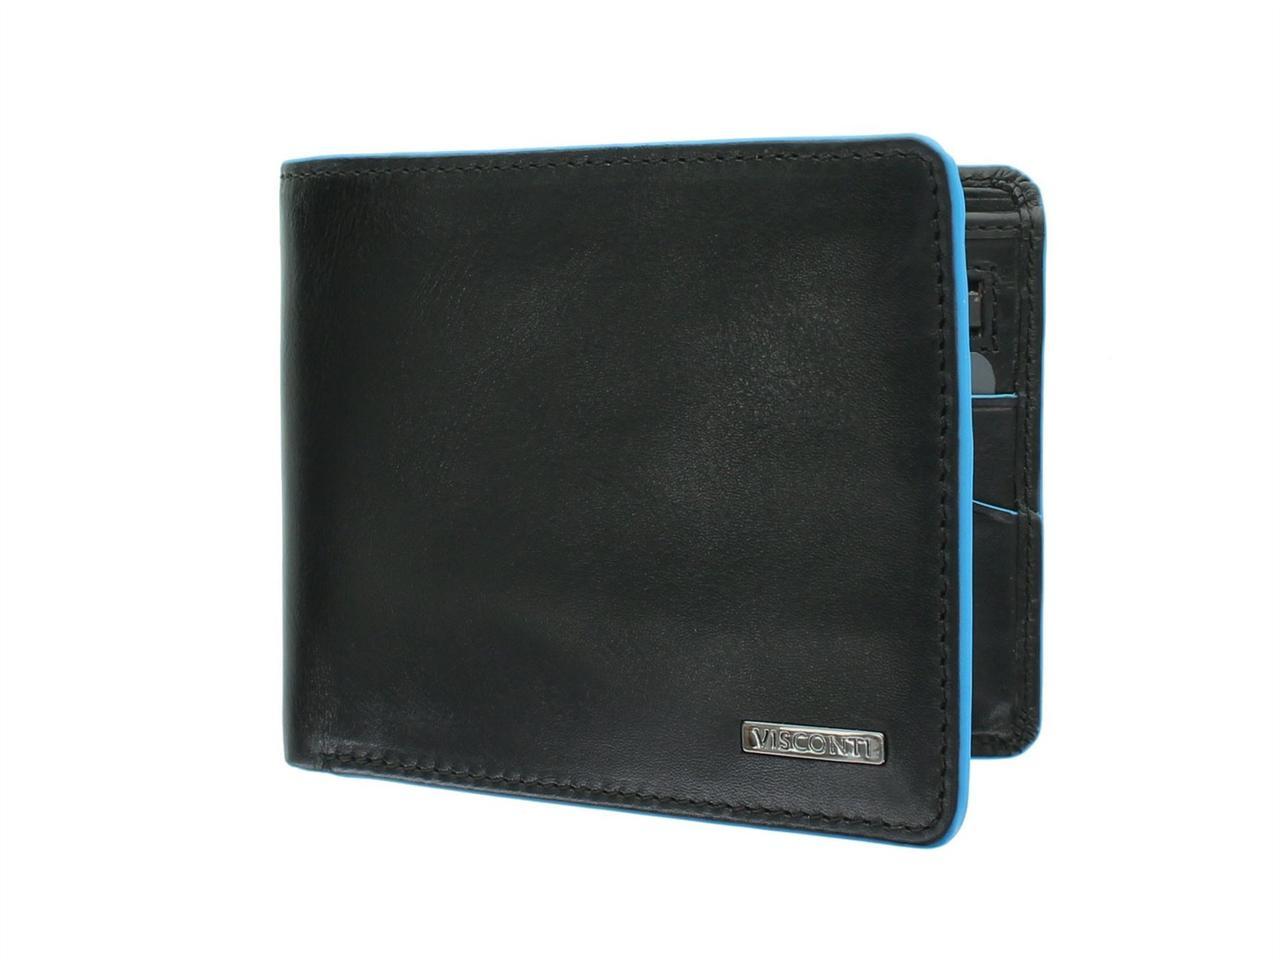 Мужское портмоне без застежки Visconti ALP85 (Великобритания)